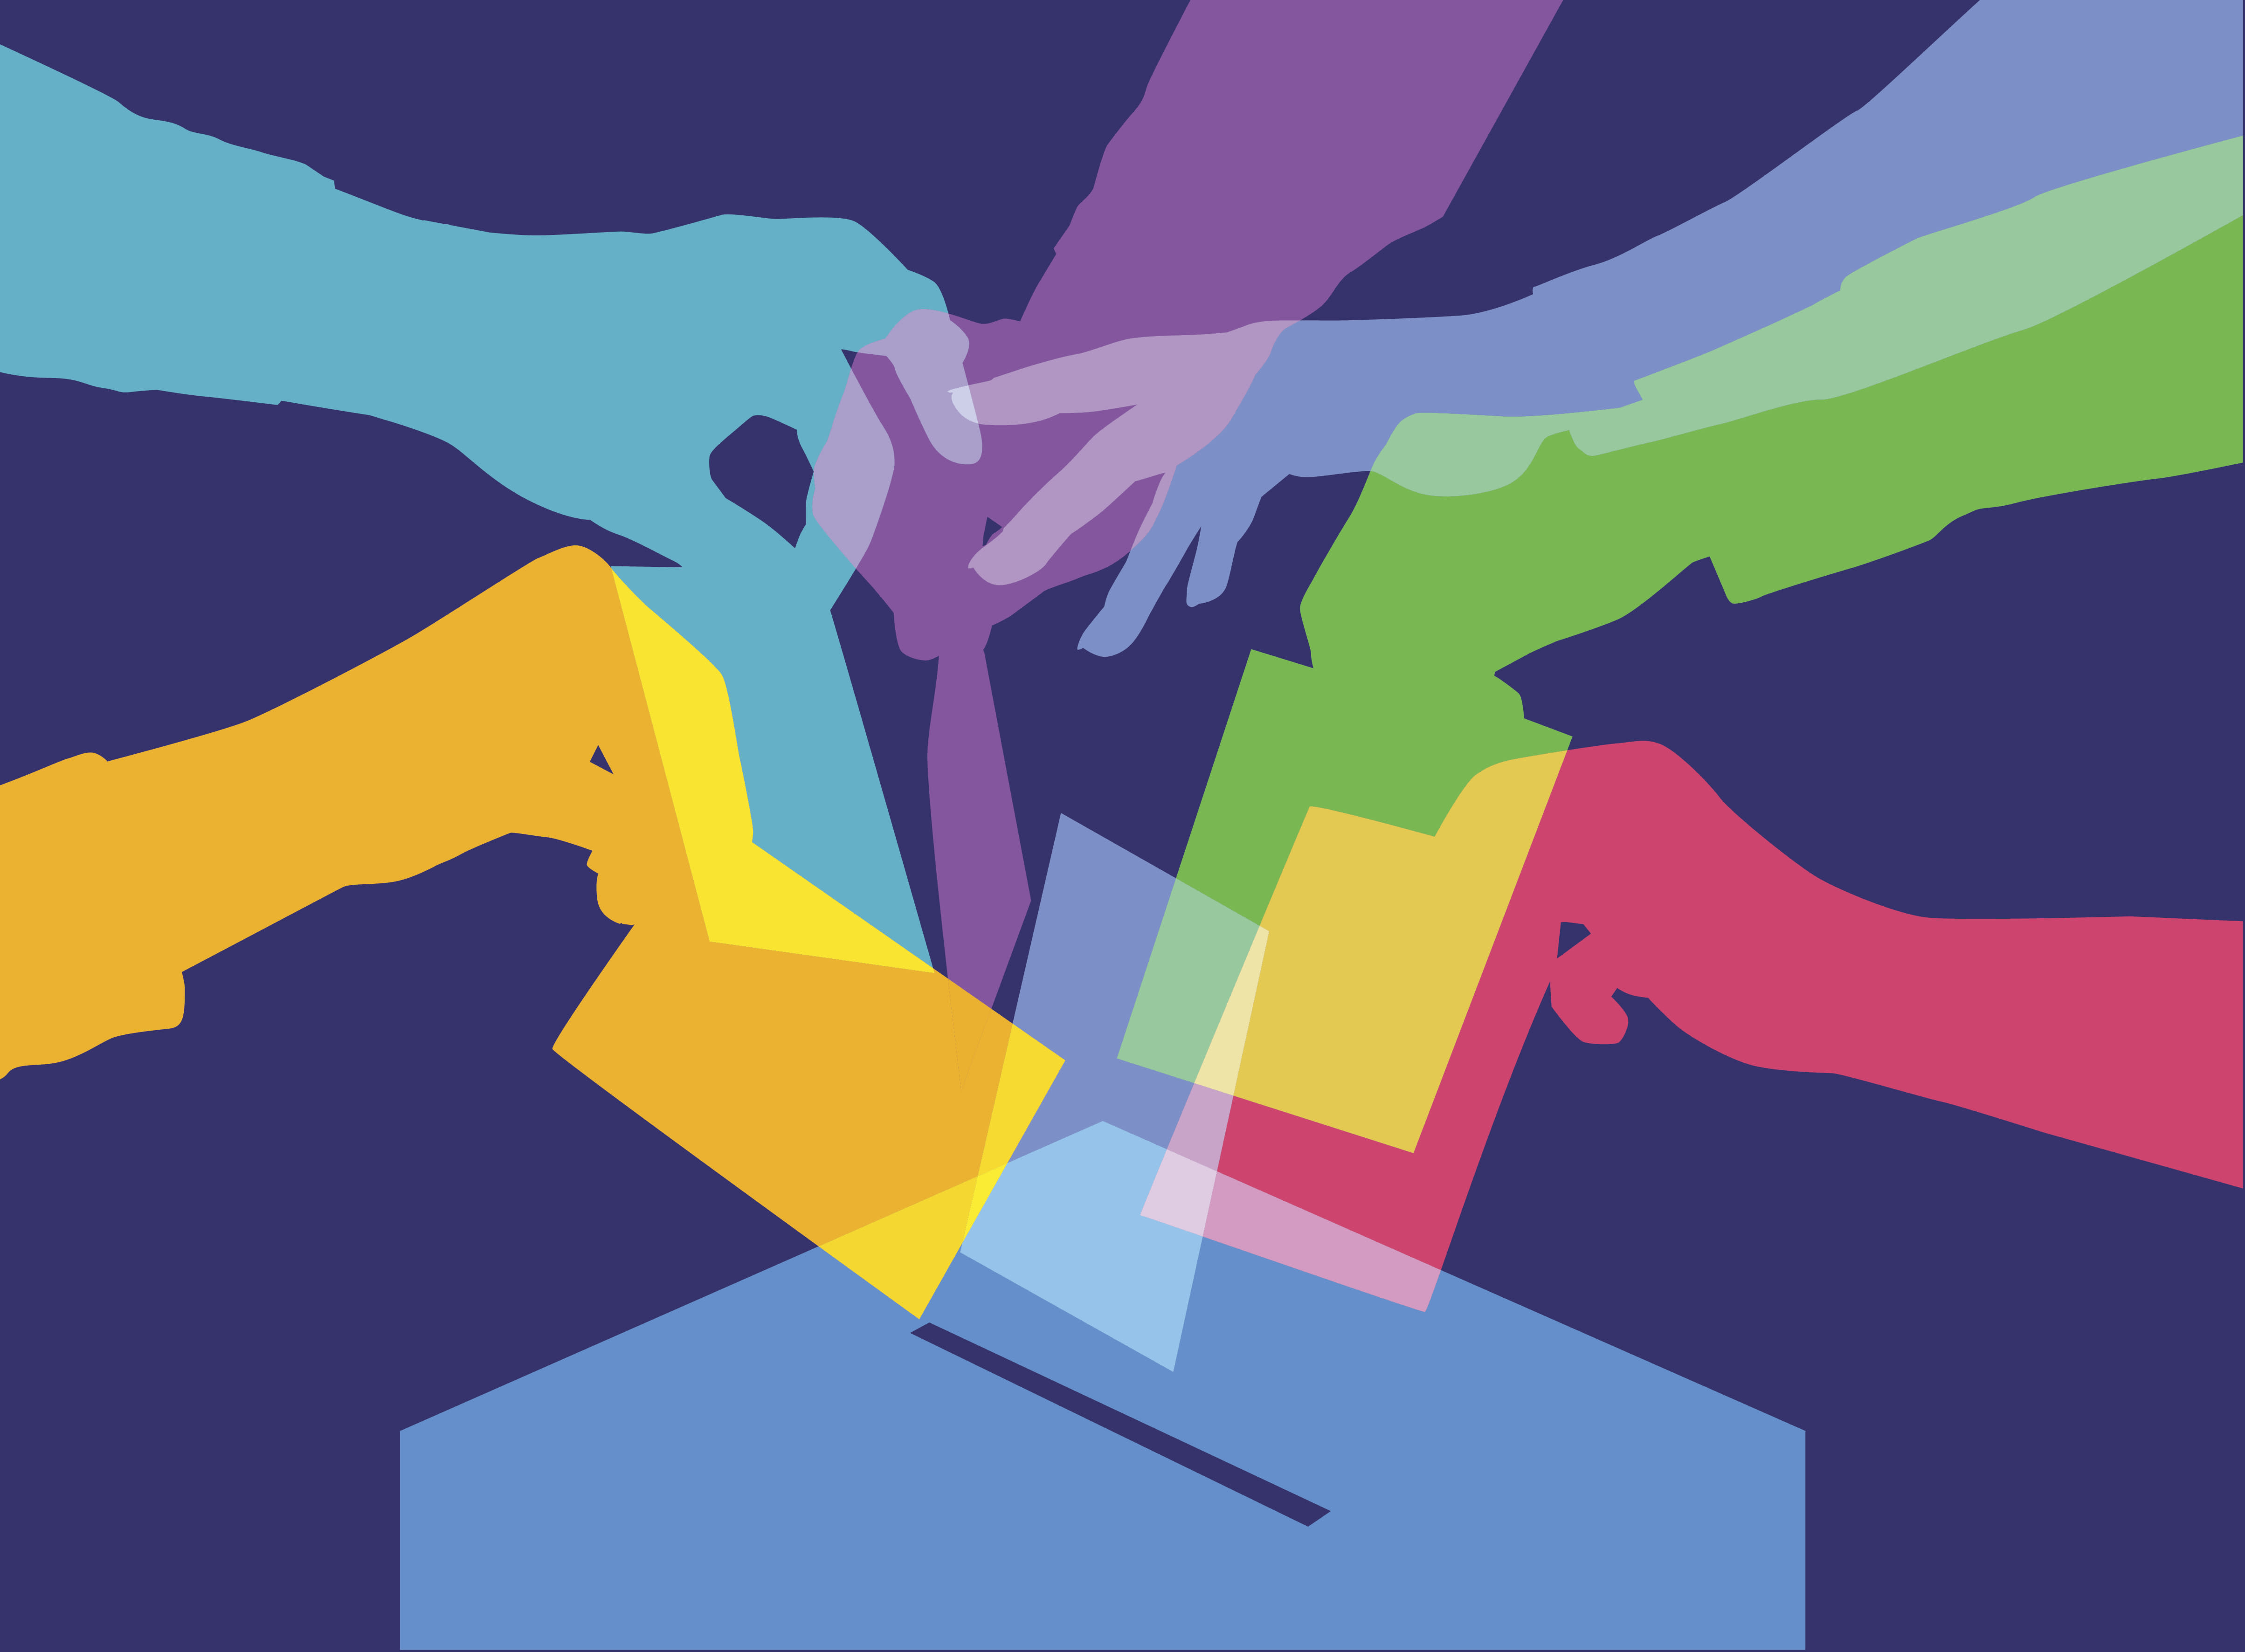 【Yahoo論壇/李鎨澂】違背公投結果的同性結婚法絕不可採 應制定同性伴侶法